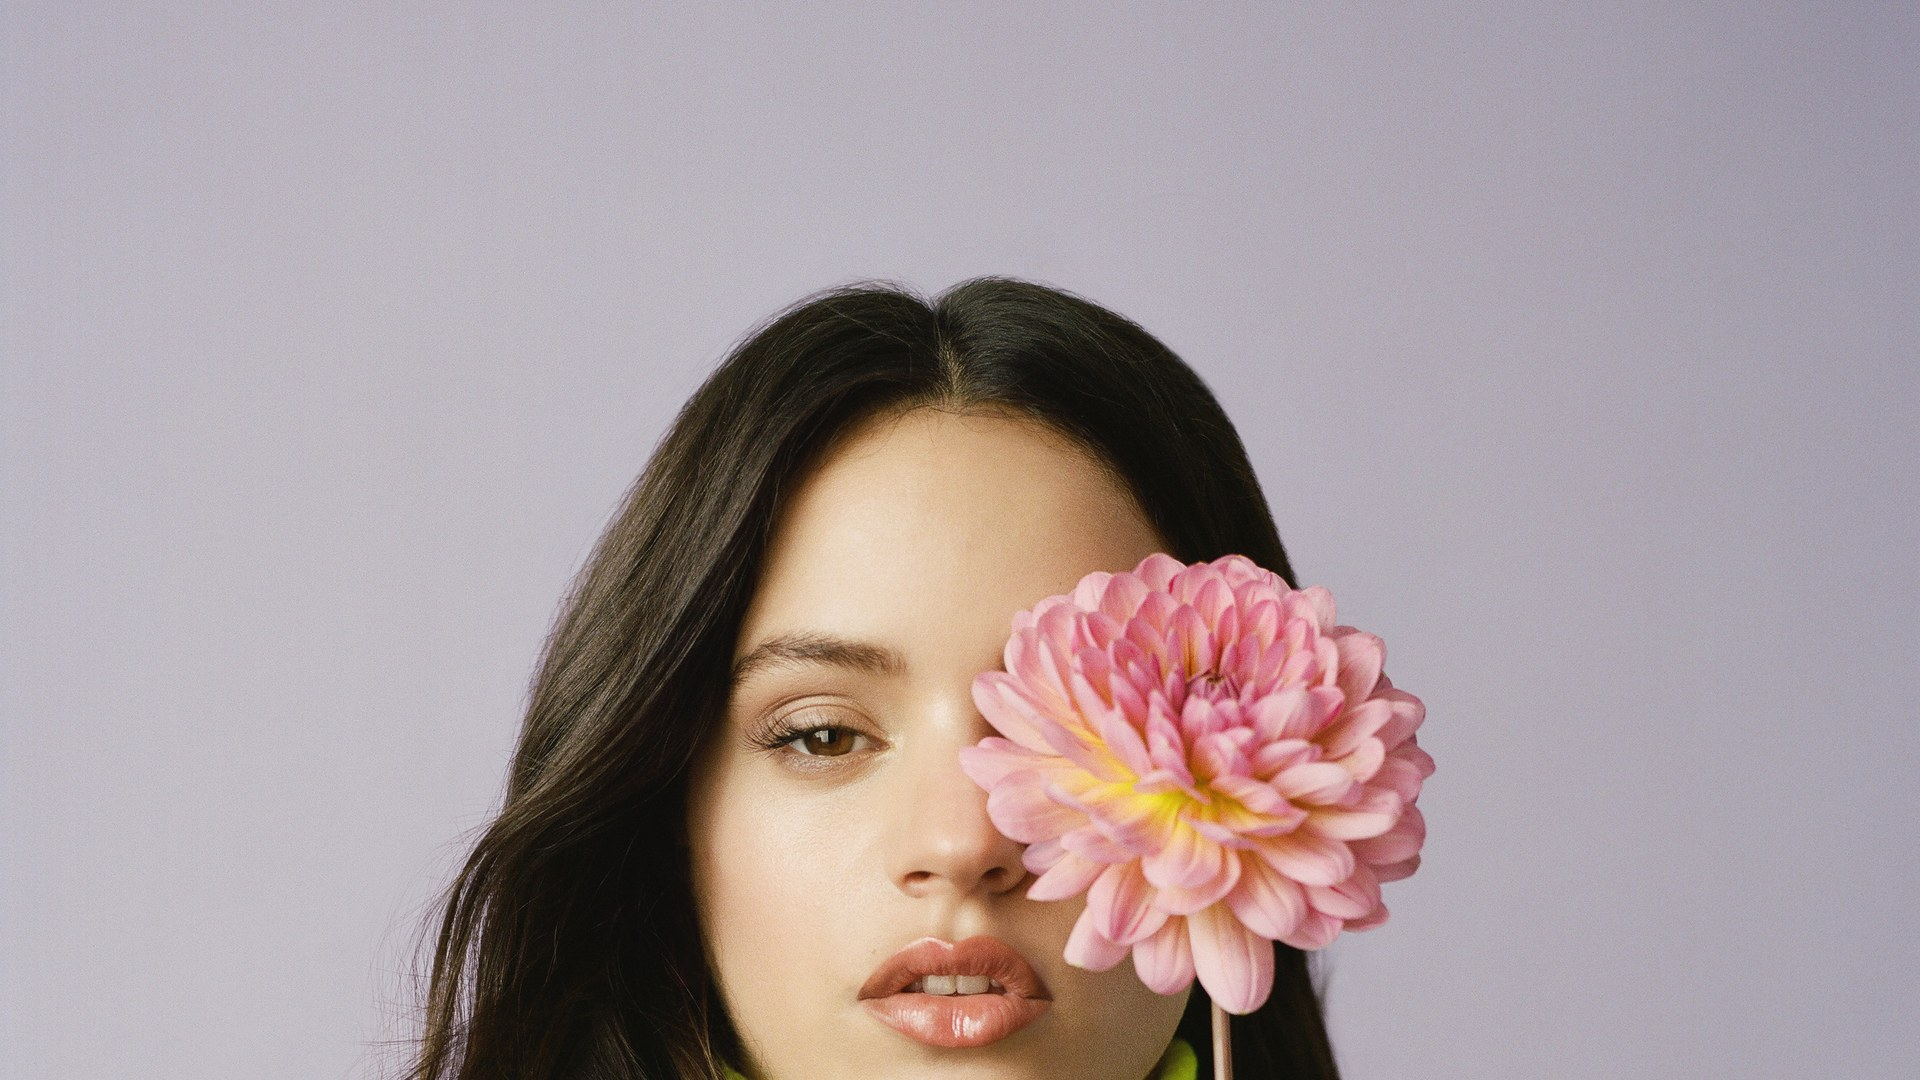 Fondos de pantalla Rosalía con flor